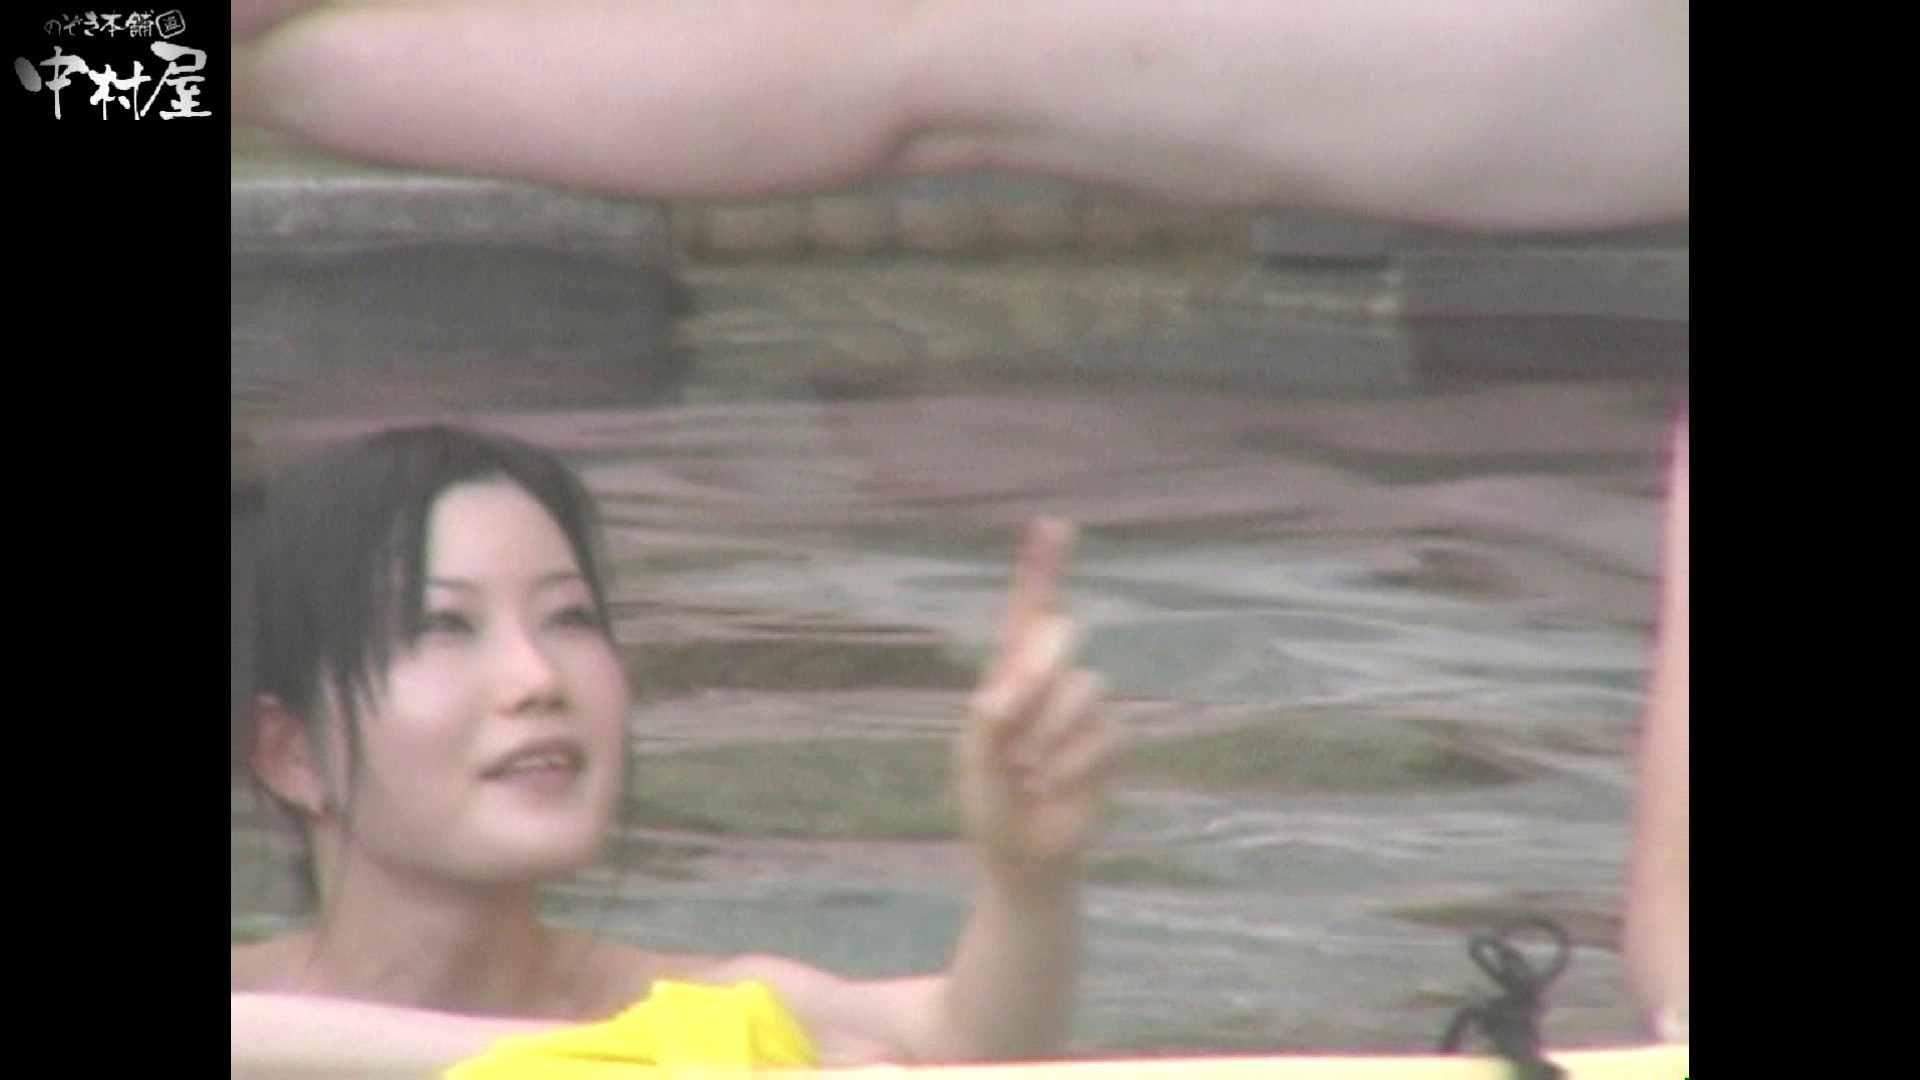 Aquaな露天風呂Vol.940 OLセックス  98画像 30